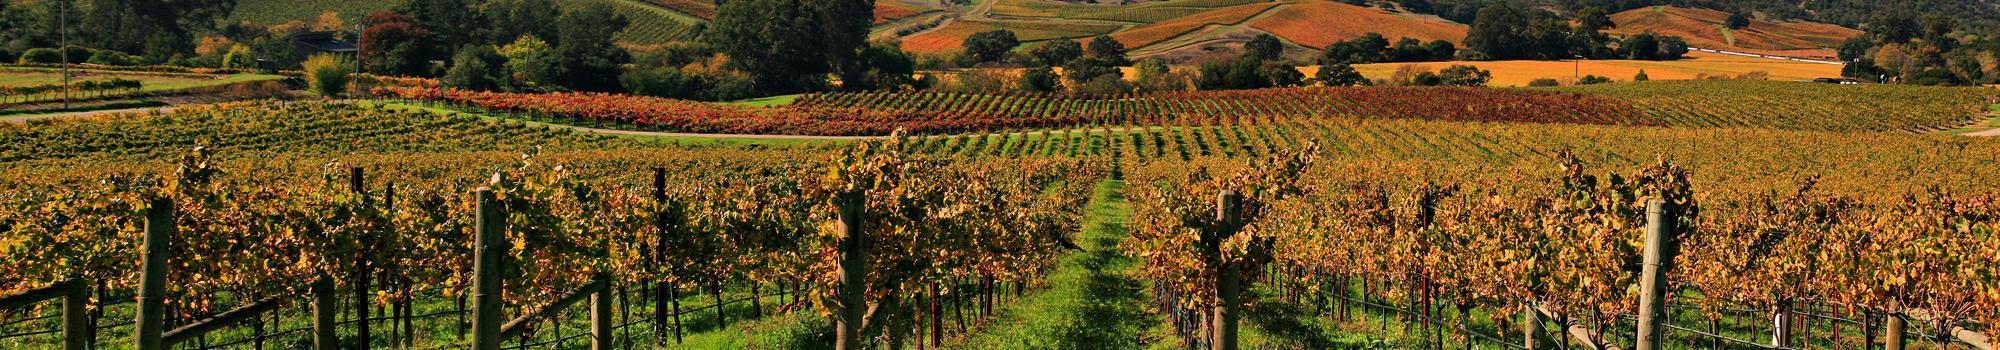 Vineyards_in_Napa_Valley_7